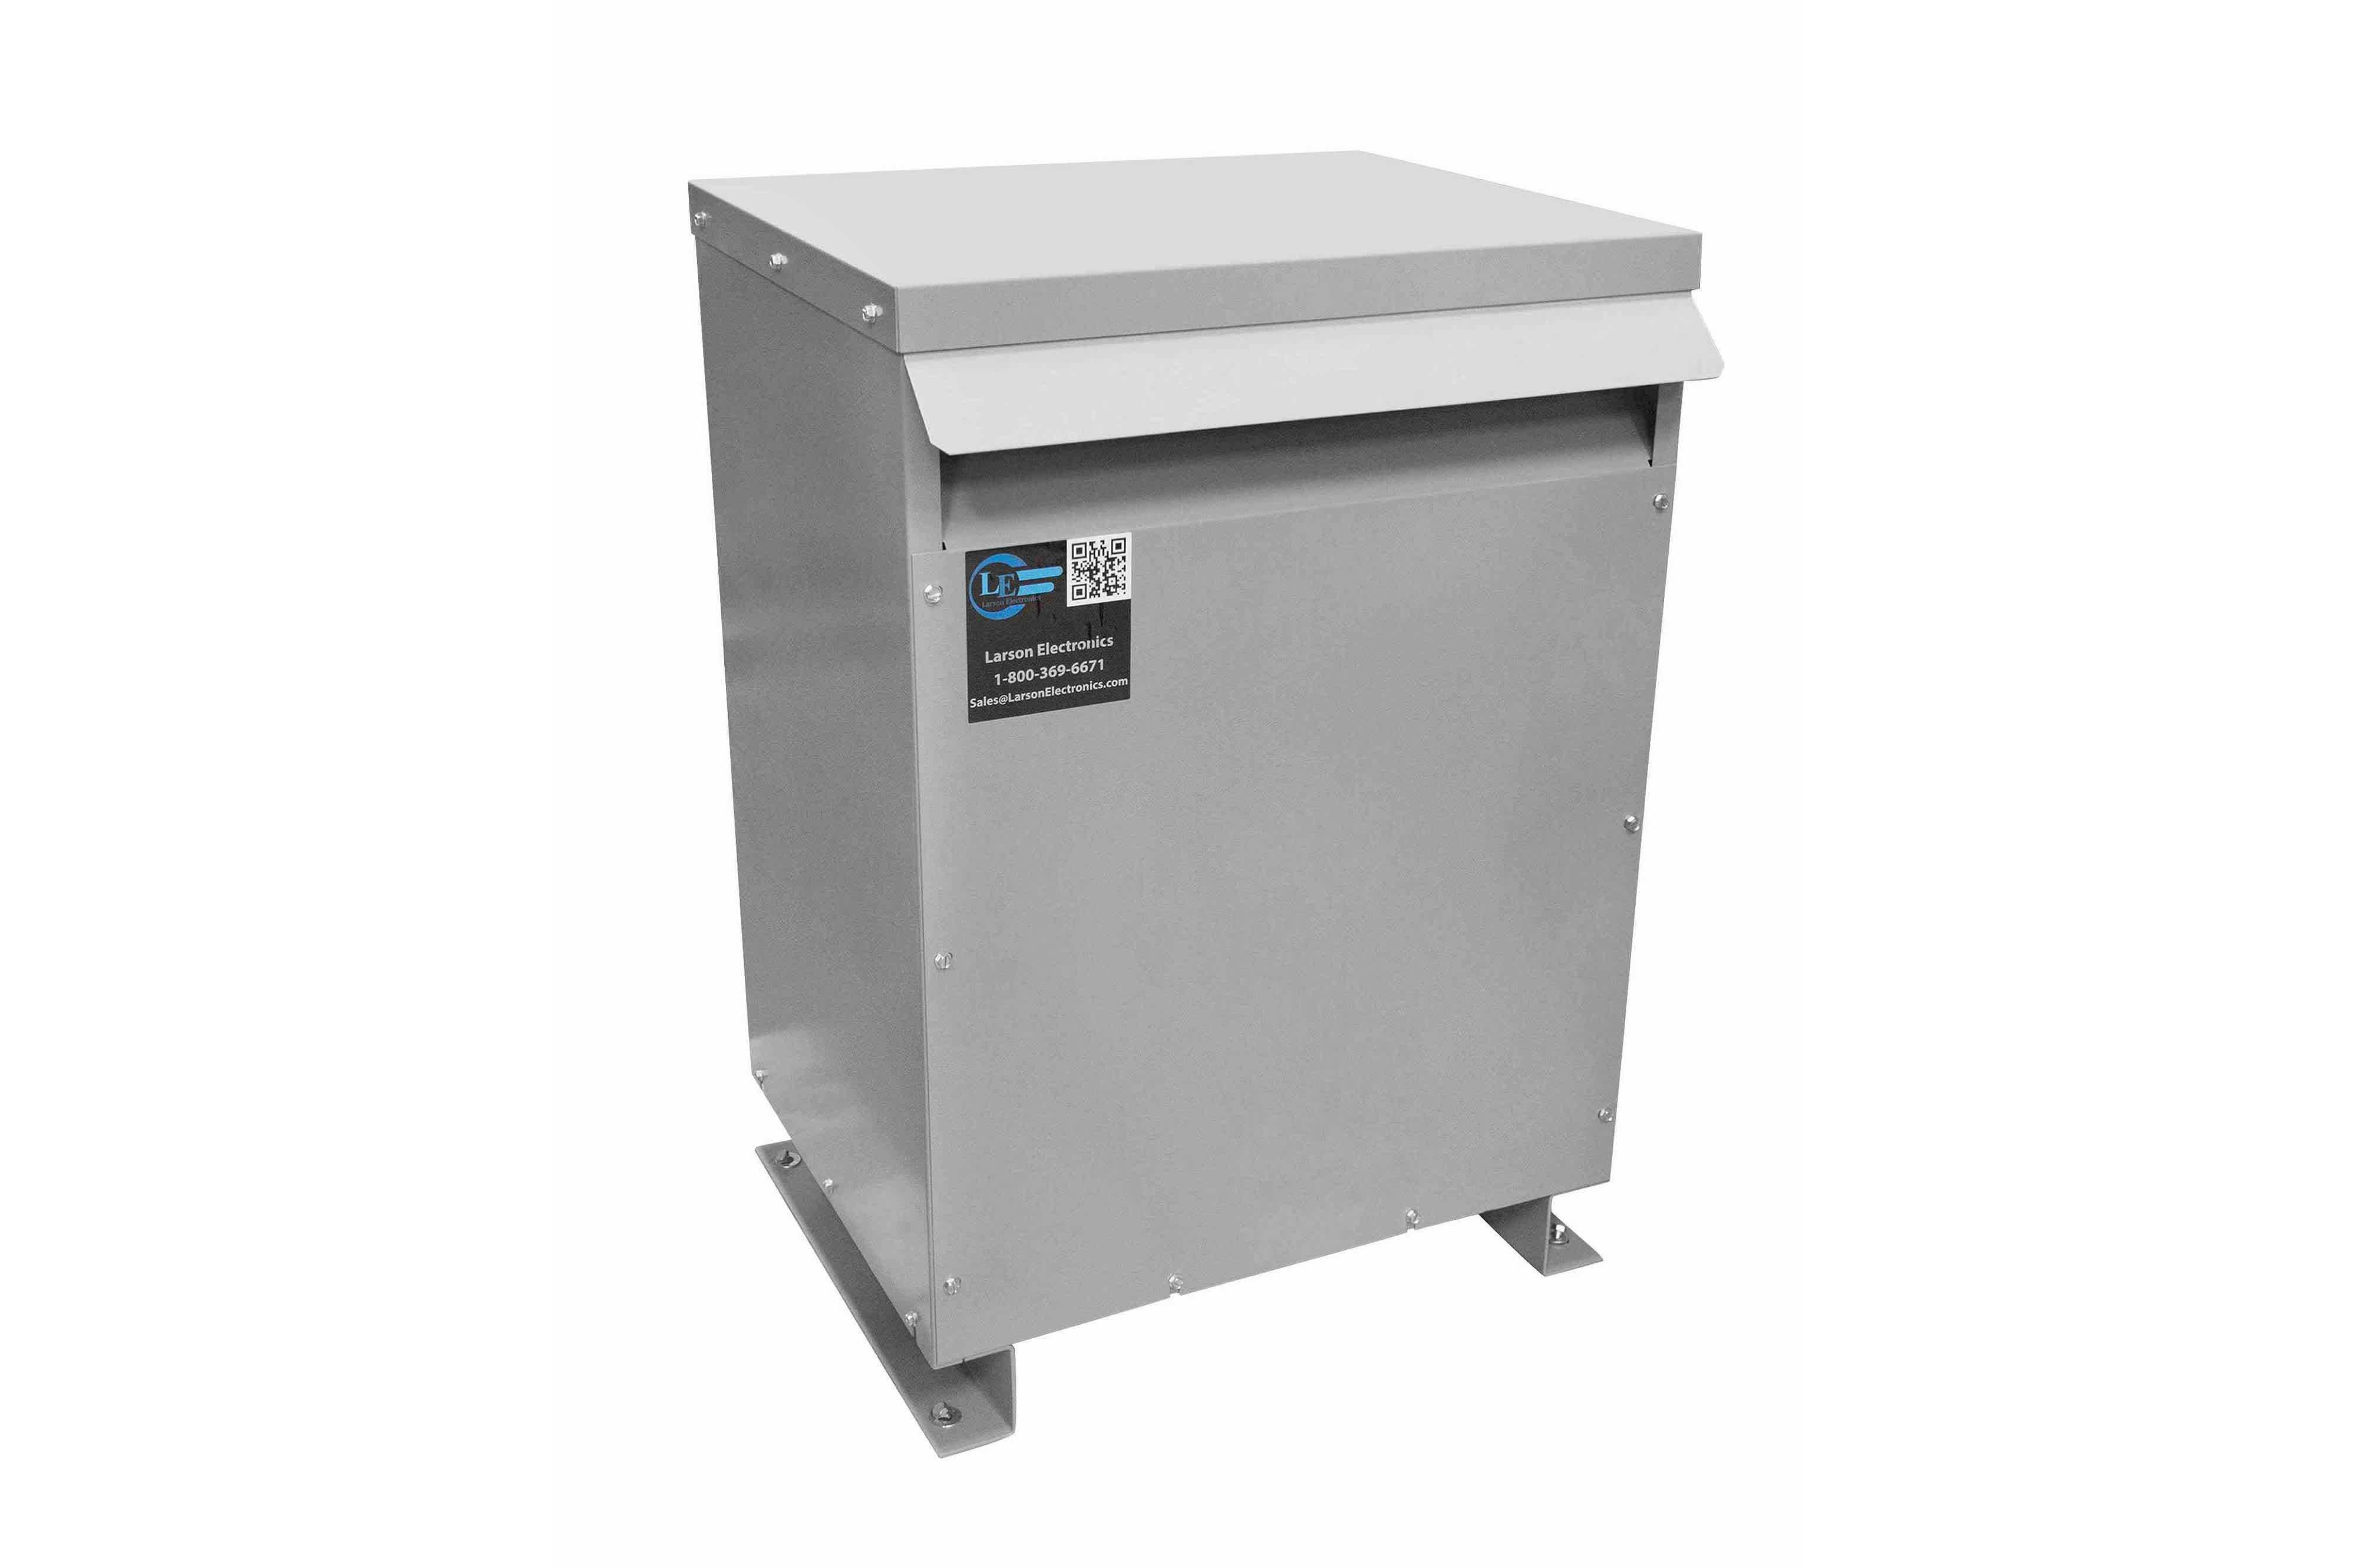 115 kVA 3PH Isolation Transformer, 600V Wye Primary, 460Y/266 Wye-N Secondary, N3R, Ventilated, 60 Hz